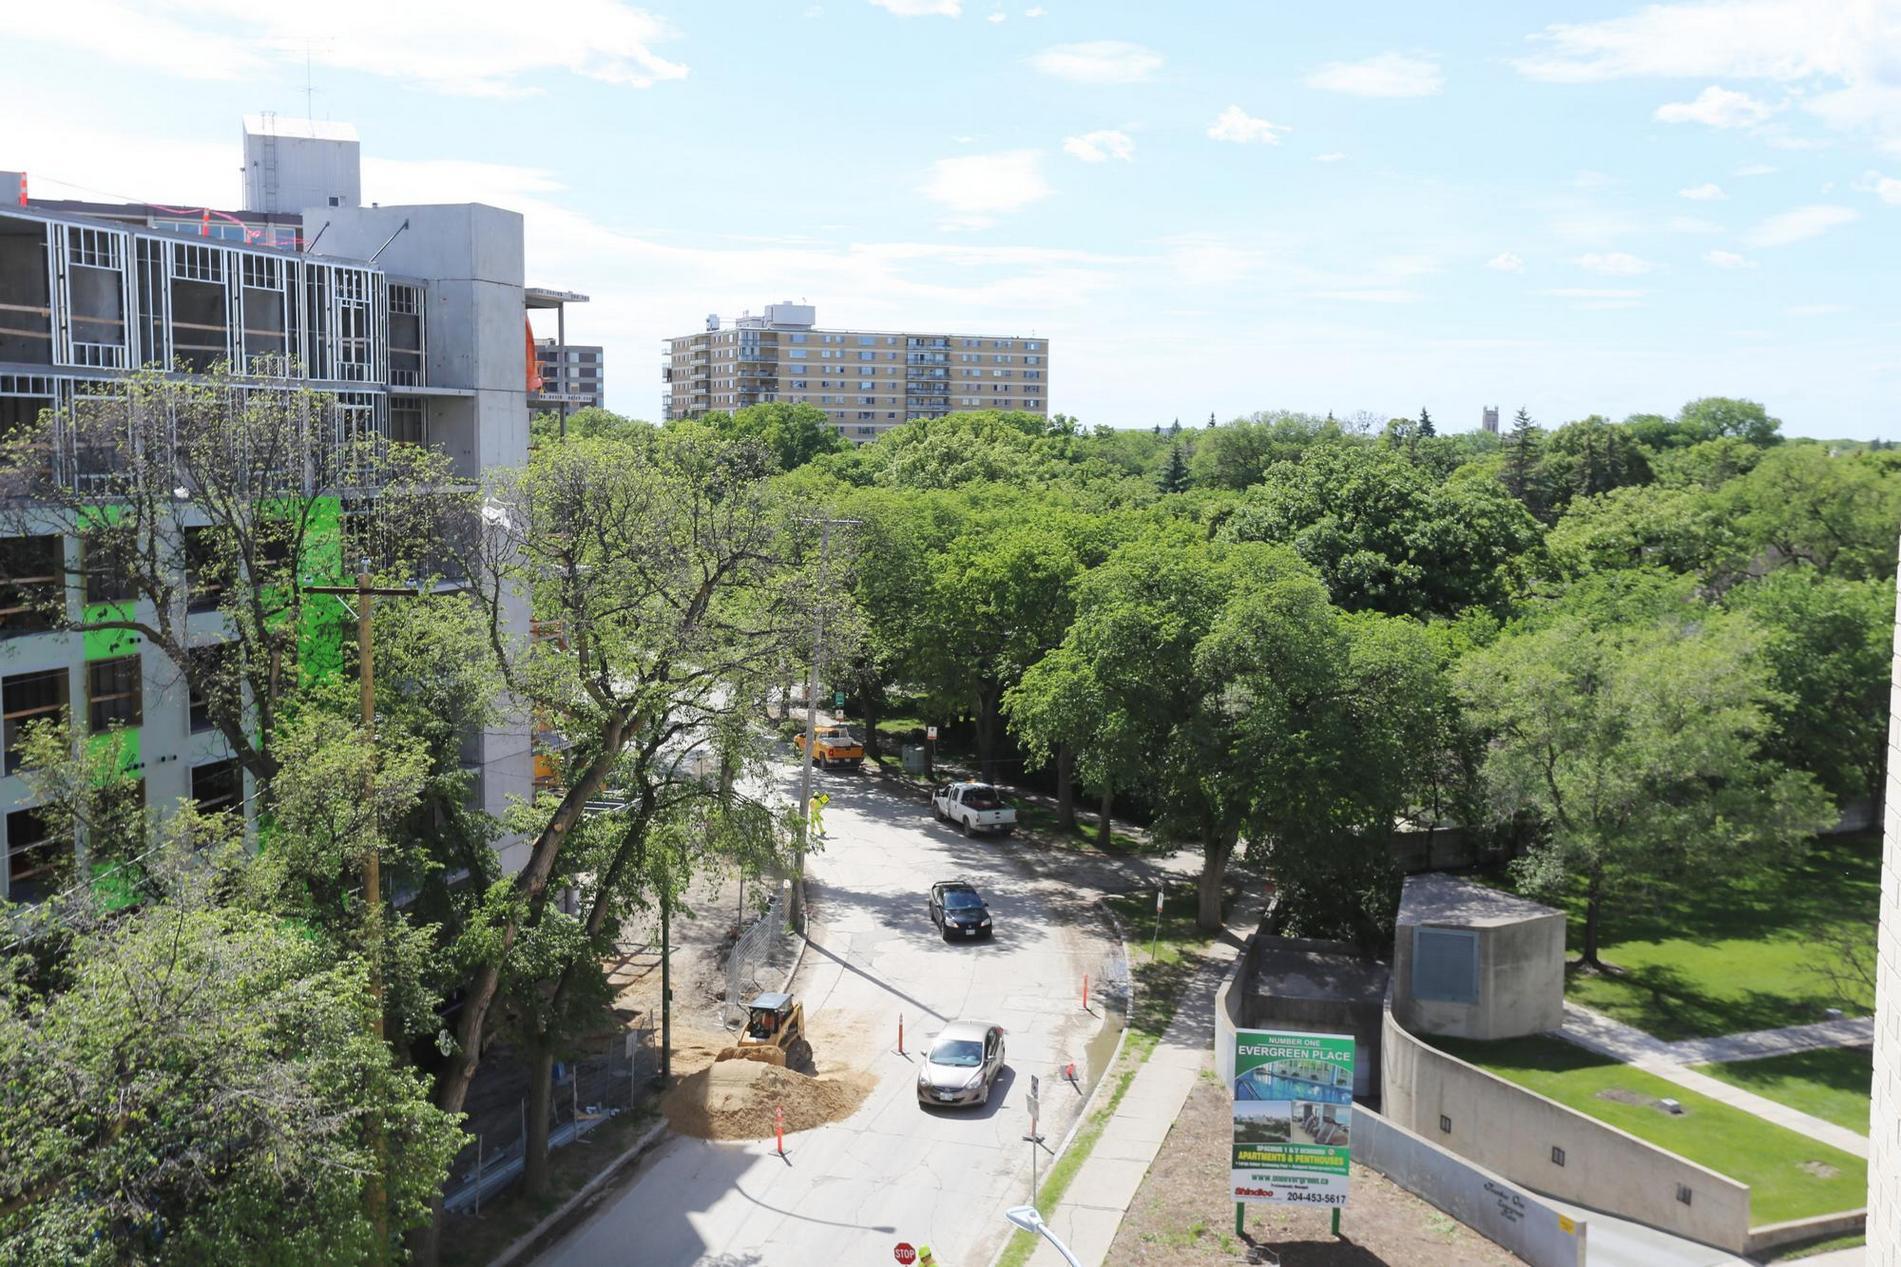 18-151 Roslyn Road, Winnipeg, Manitoba  R3L 0G5 - Photo 27 - 1816191